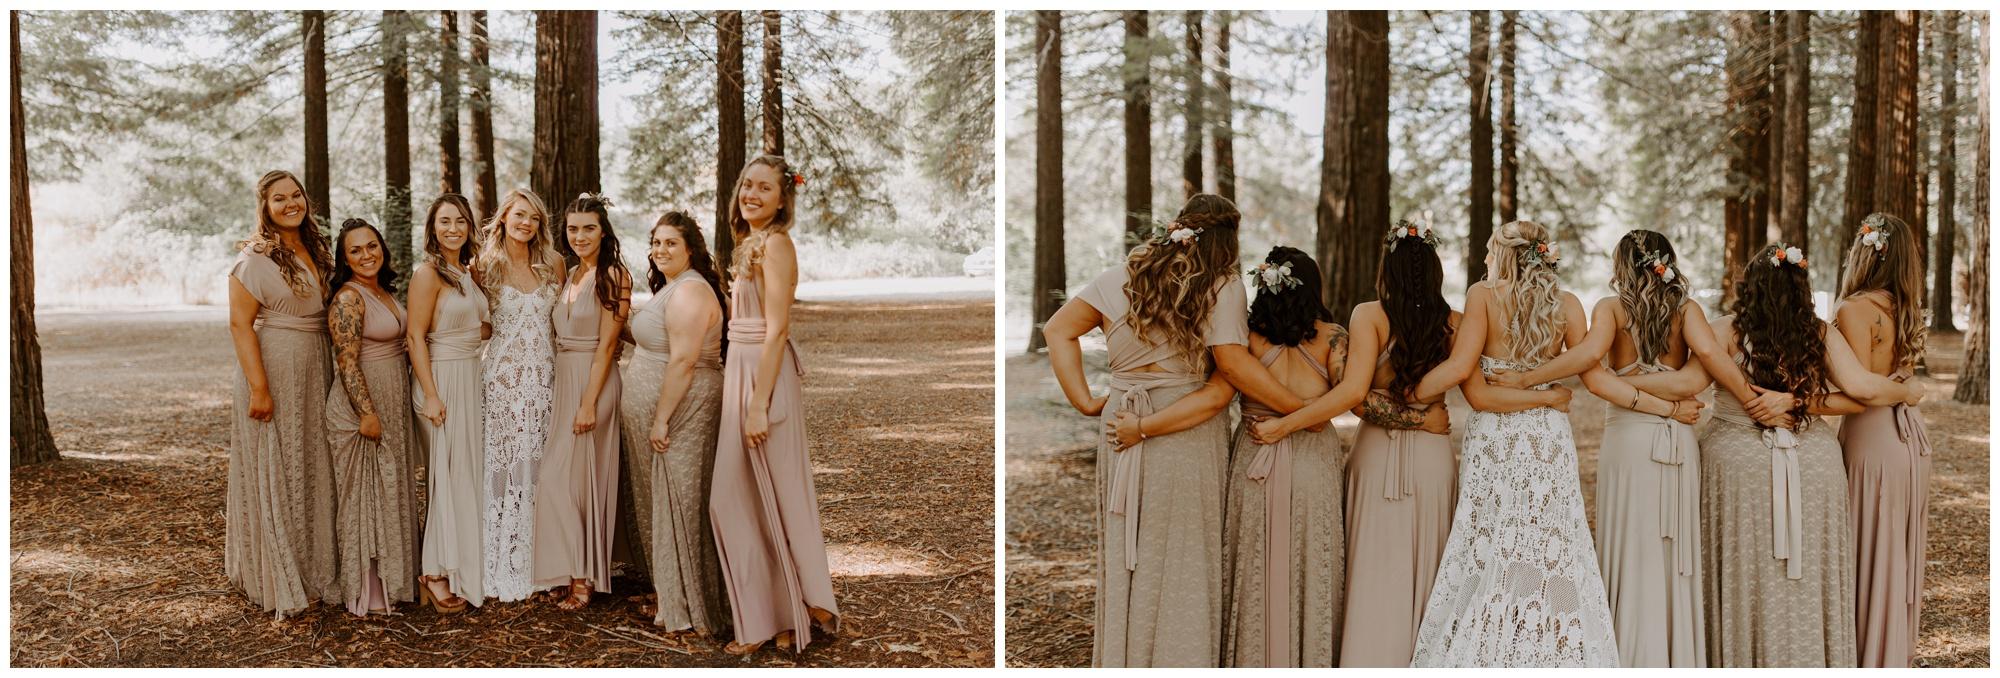 Redwood Festival Wedding Humbolt California - Jessica Heron Images_0019.jpg